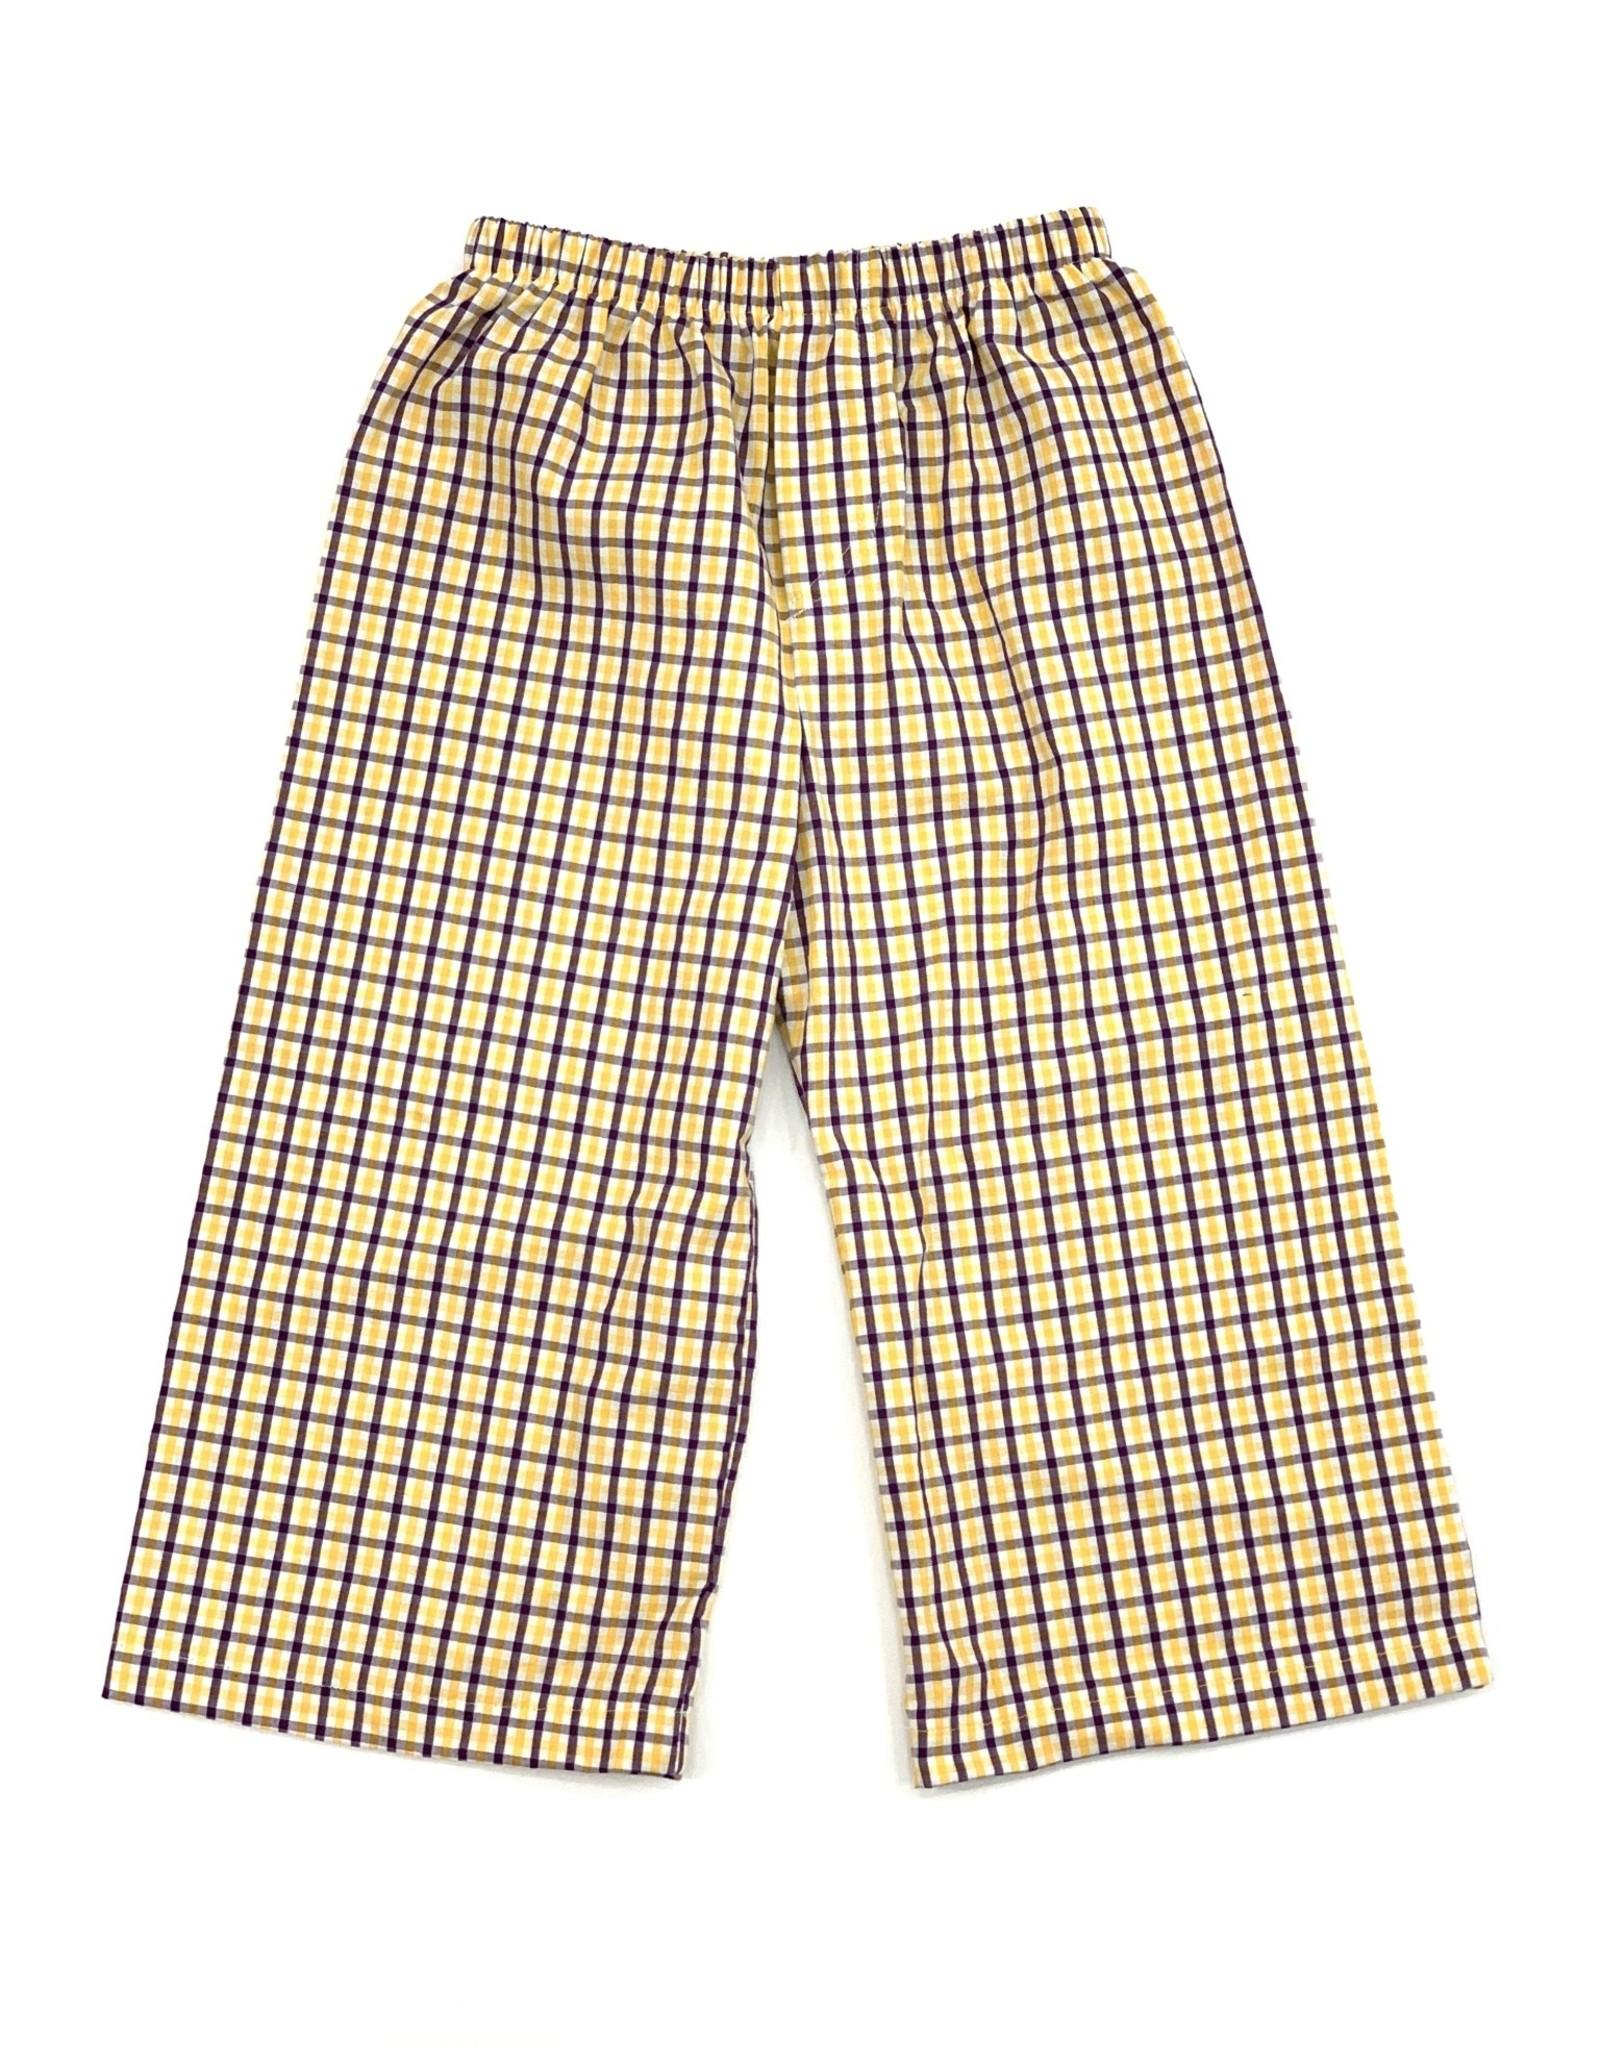 Funstyle LSU Boys Pants